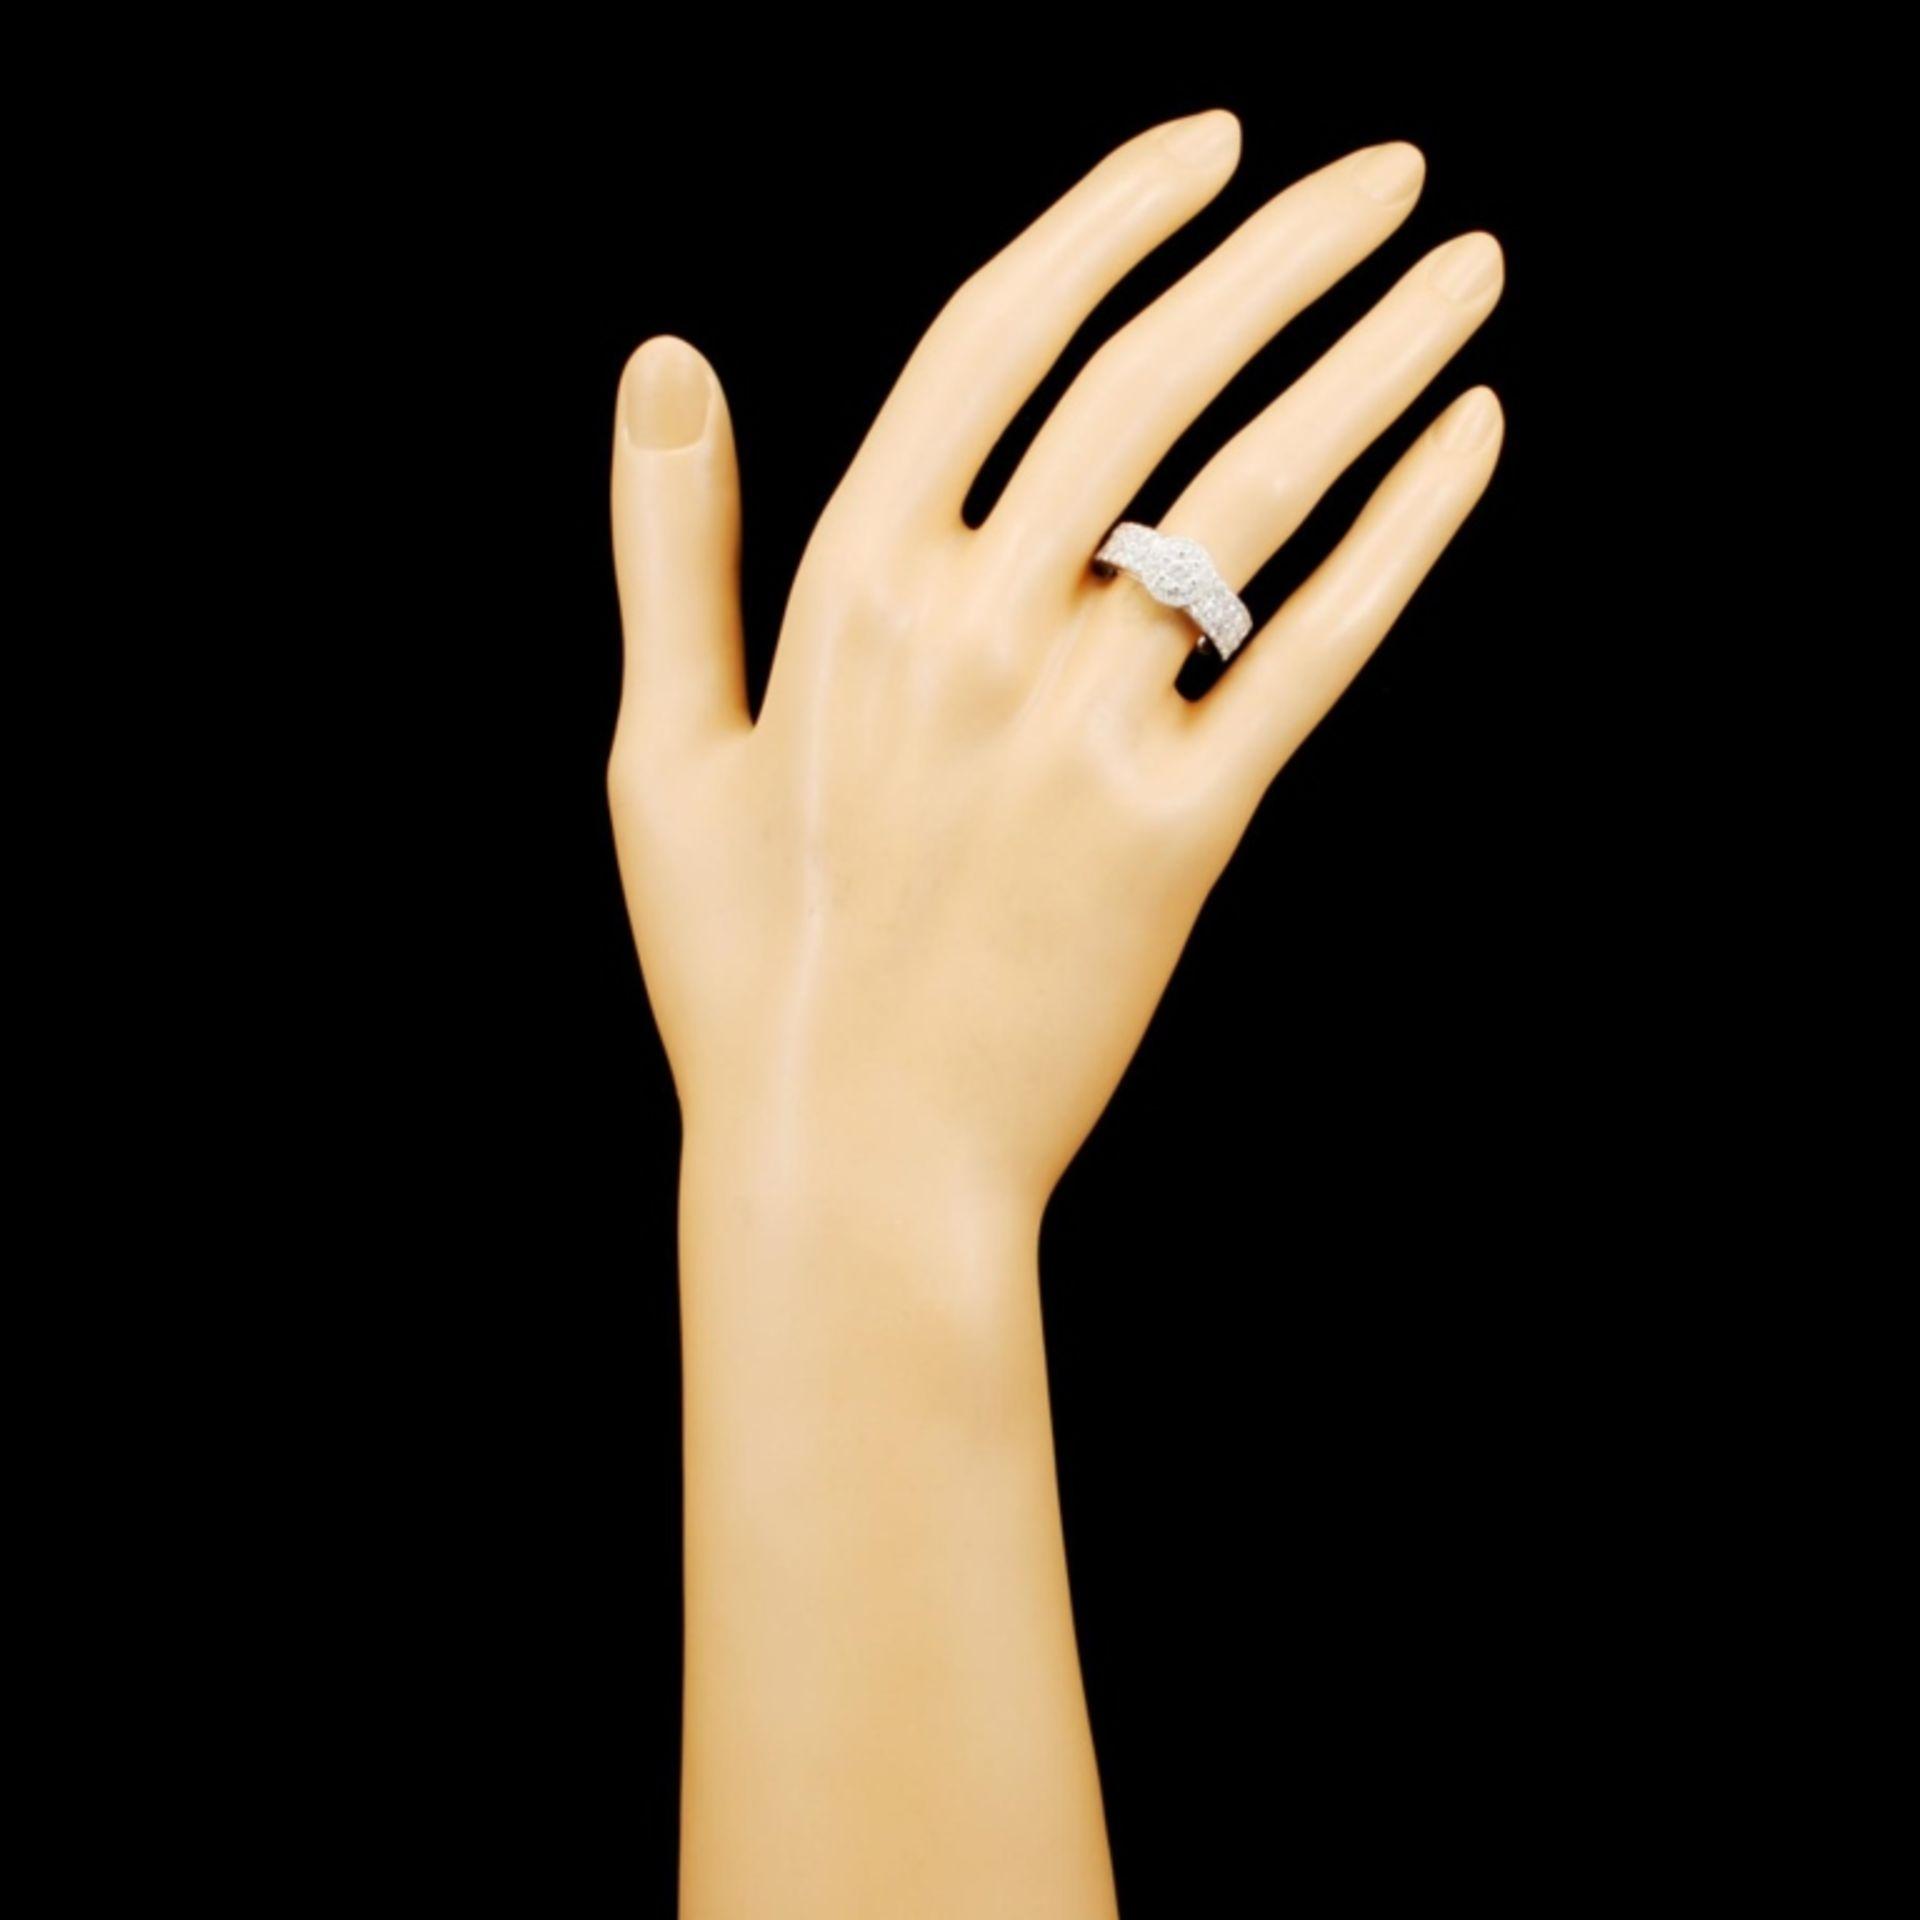 14K Gold 2.39ctw Diamond Ring - Image 4 of 5